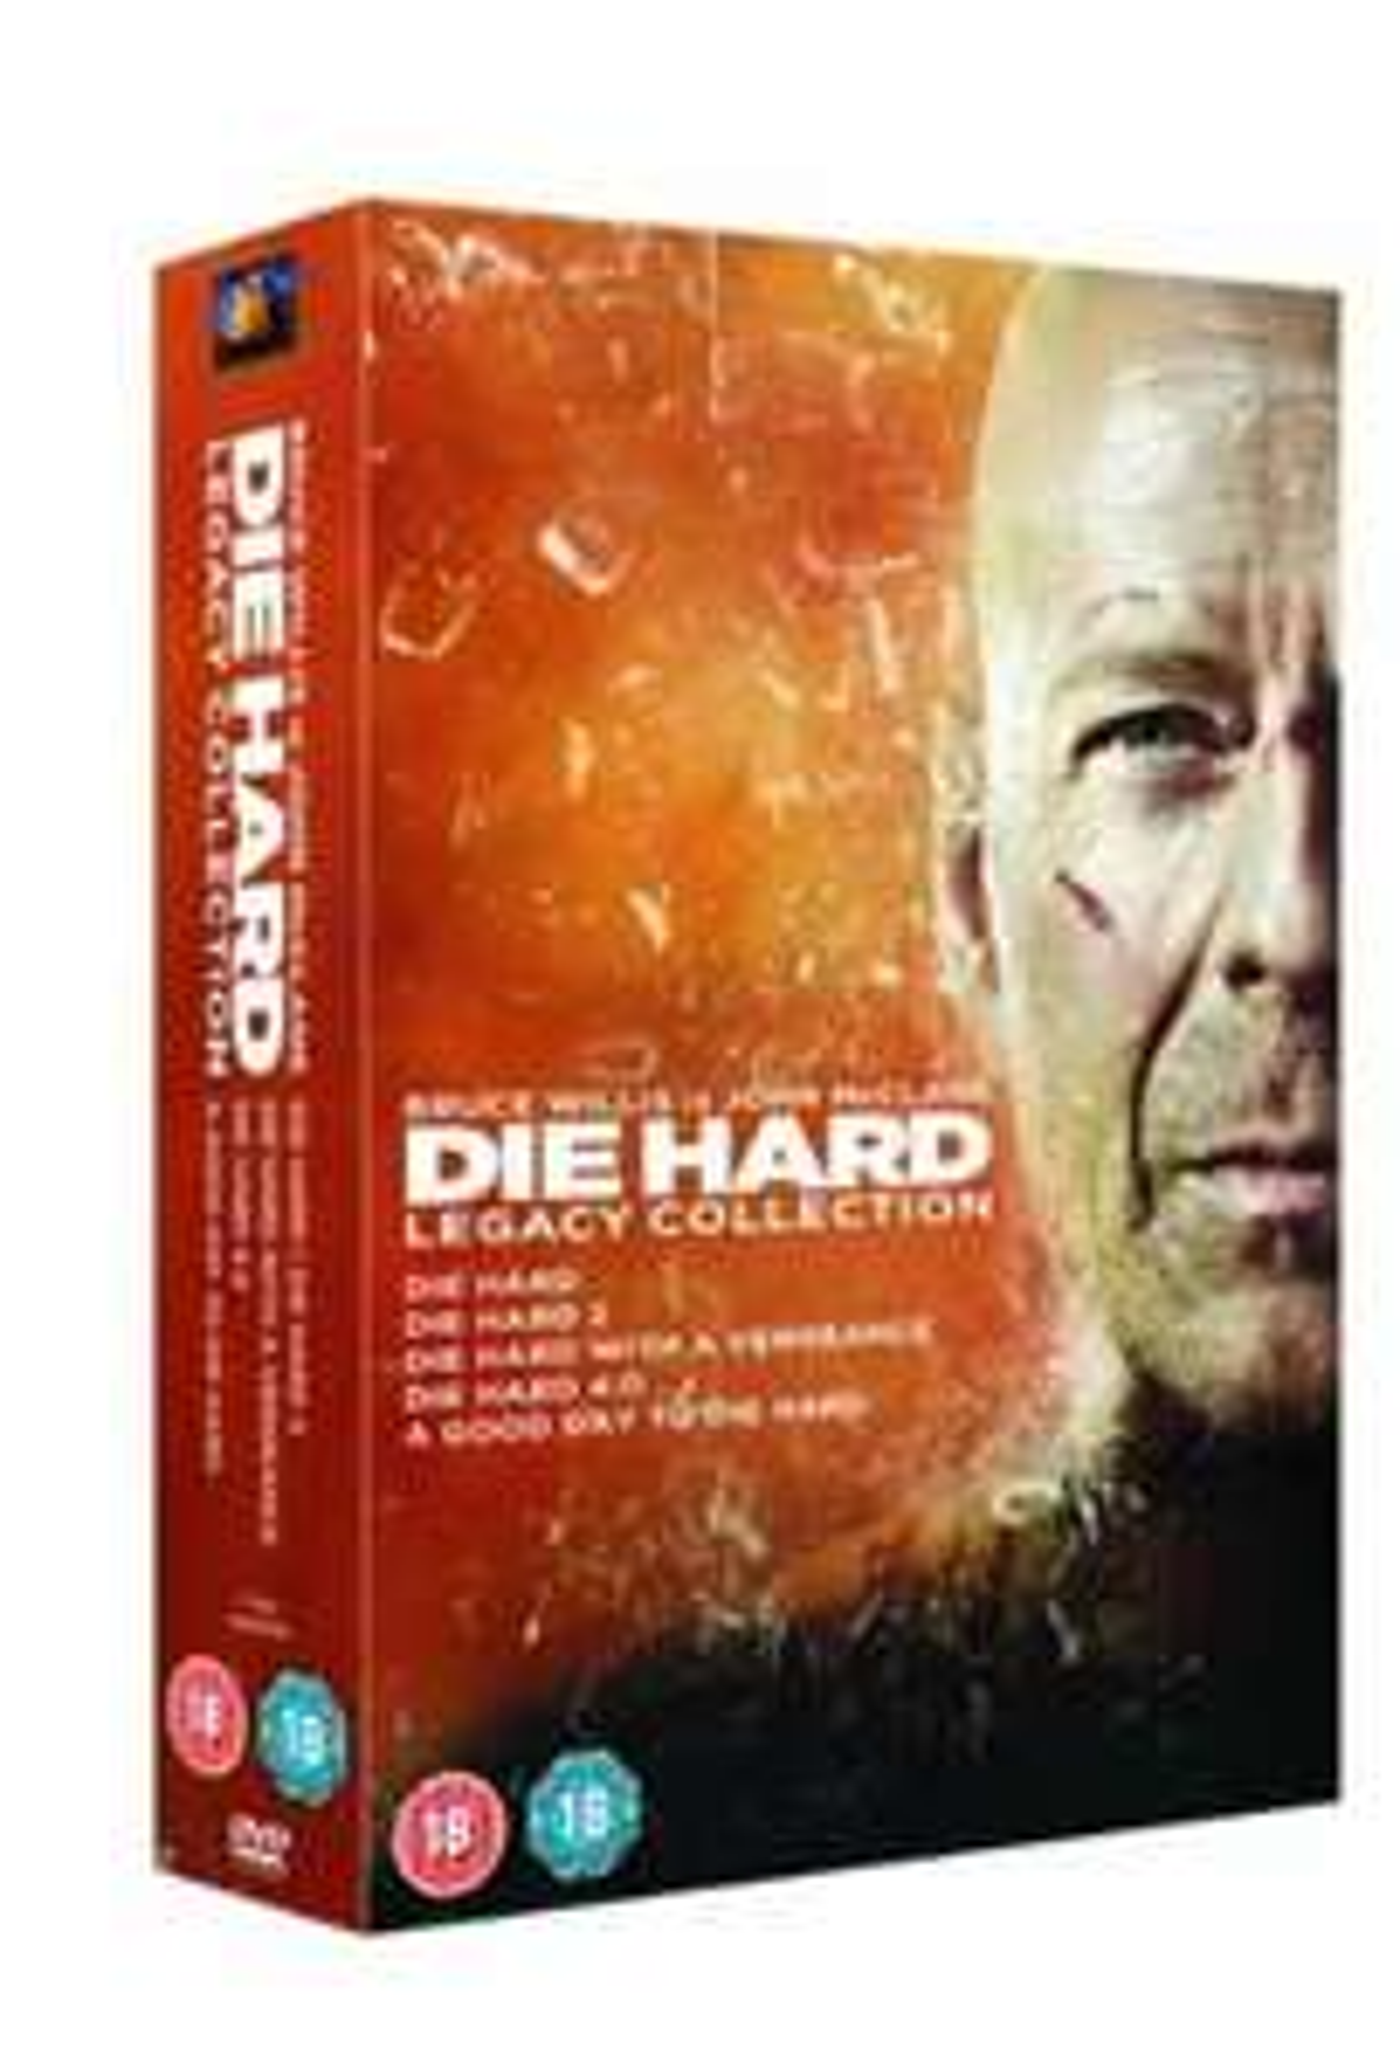 Die Hard - Legacy Collection **NEW** (DVD) ebay dvd_overstocks_ltd - £9.99